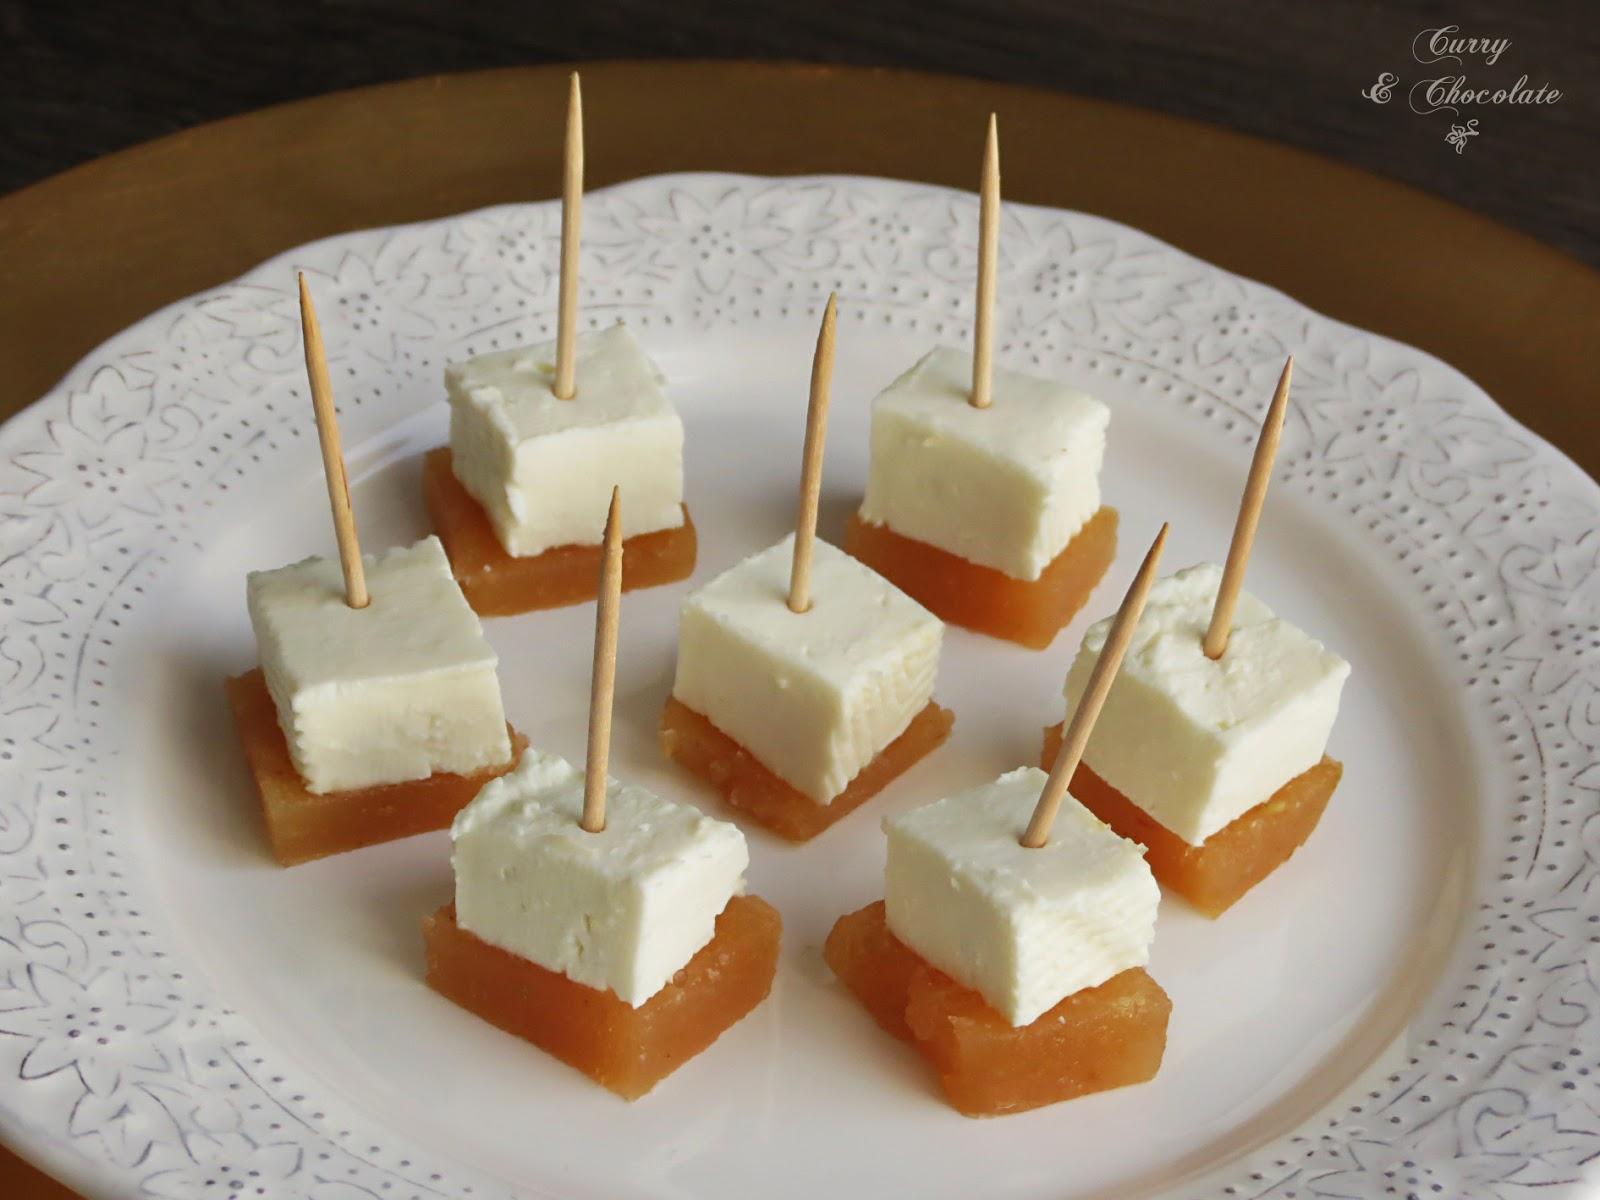 Daditos de queso fresco con membrillo